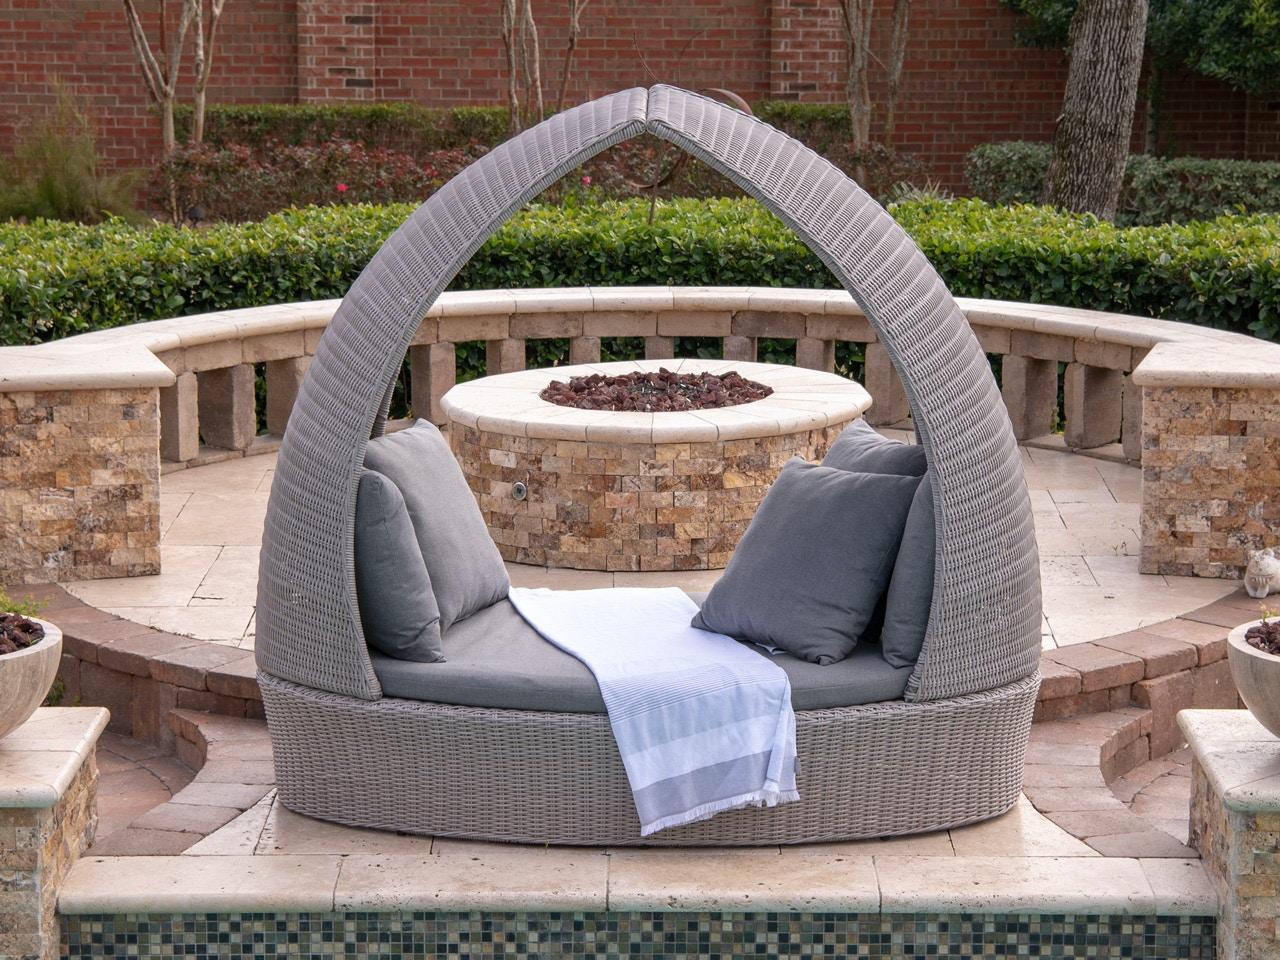 When will patio furniture go on sale